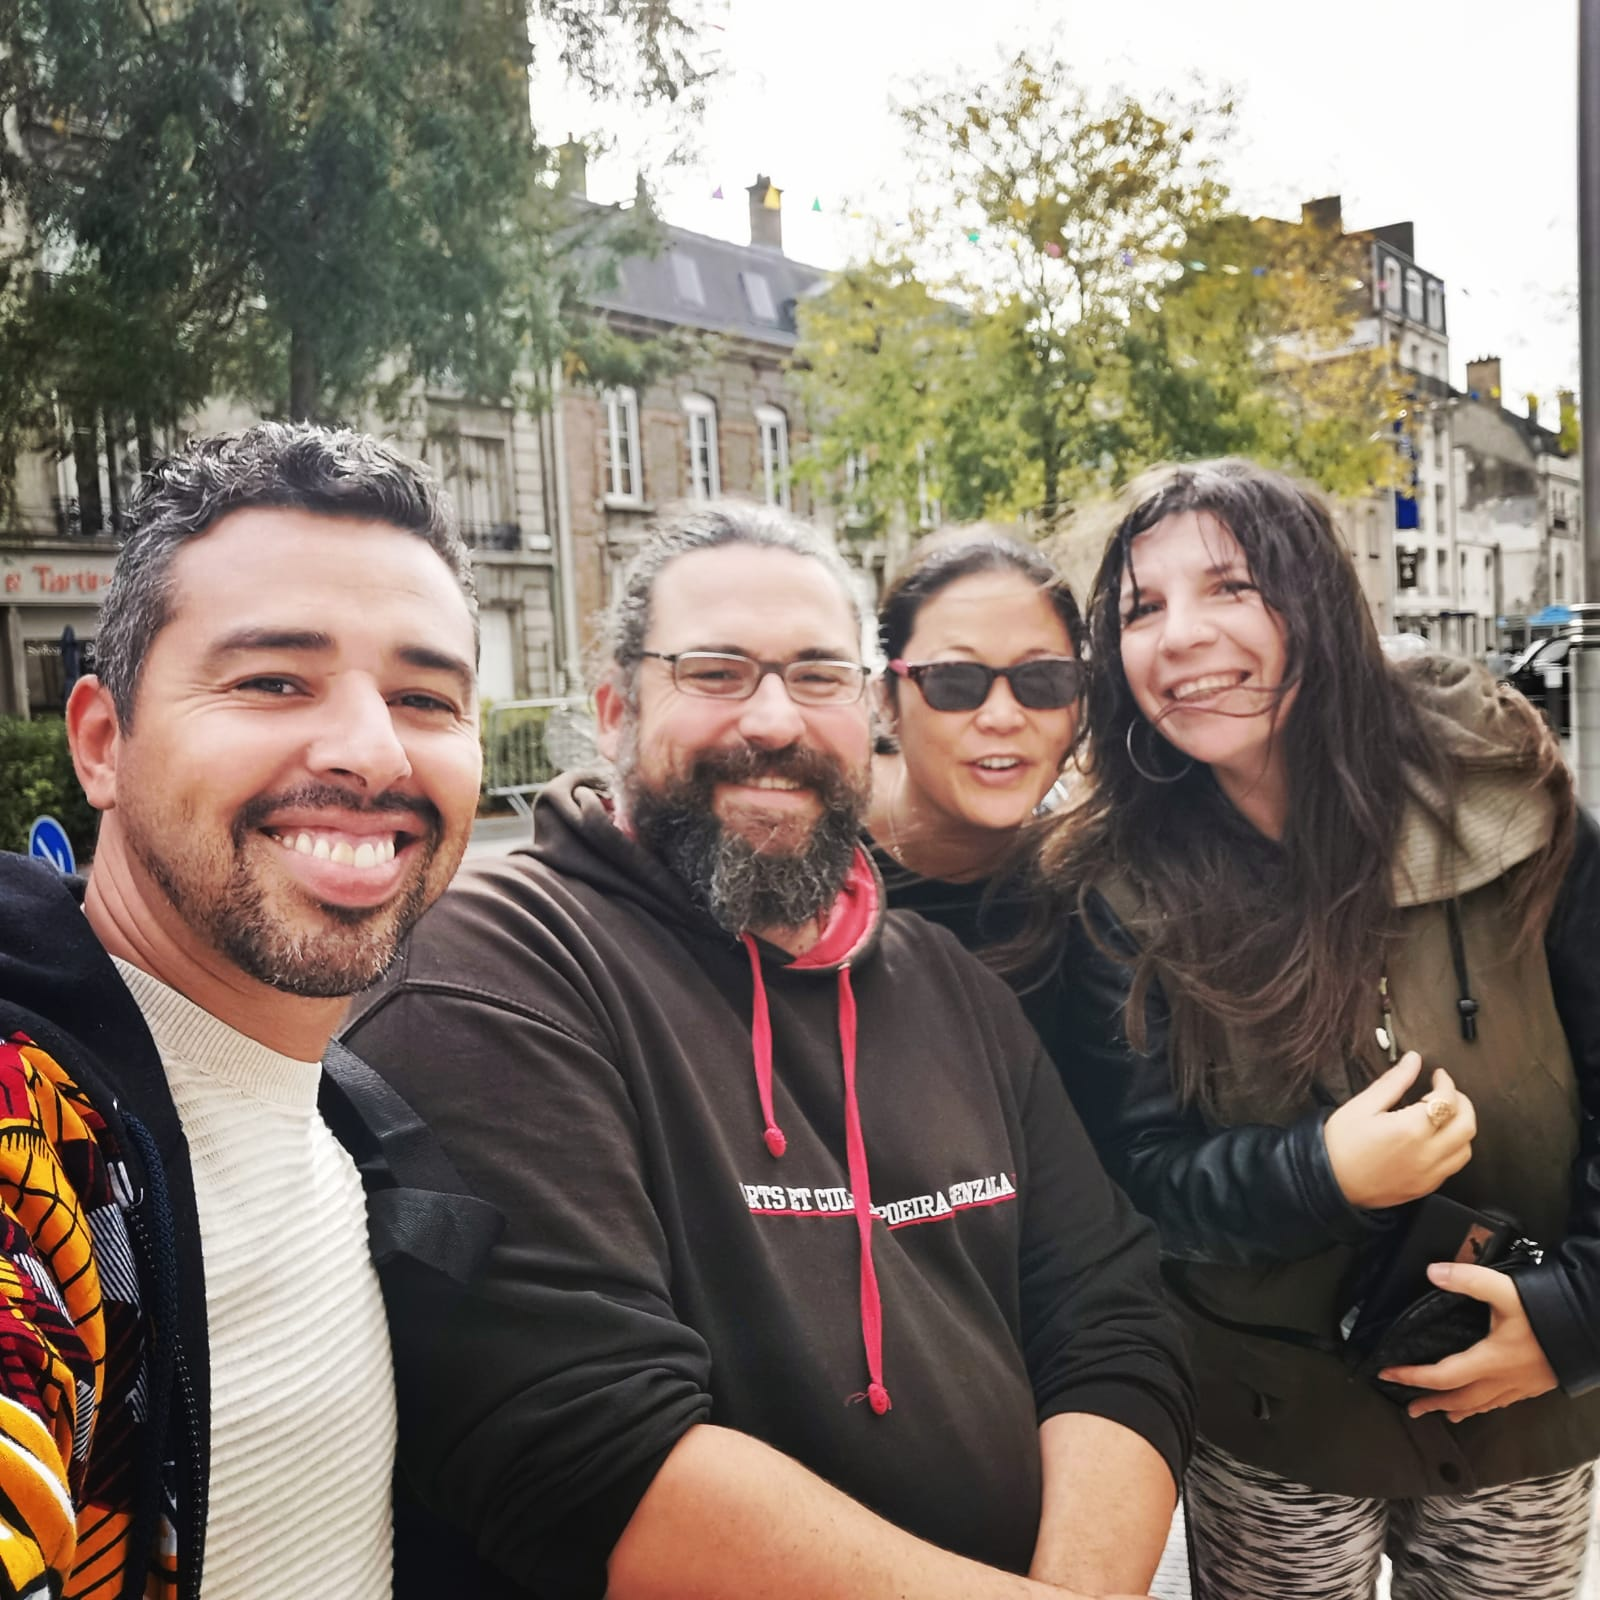 CONVIVIALITE - 2021 - Octobre - Visite de nos amis de Lyon